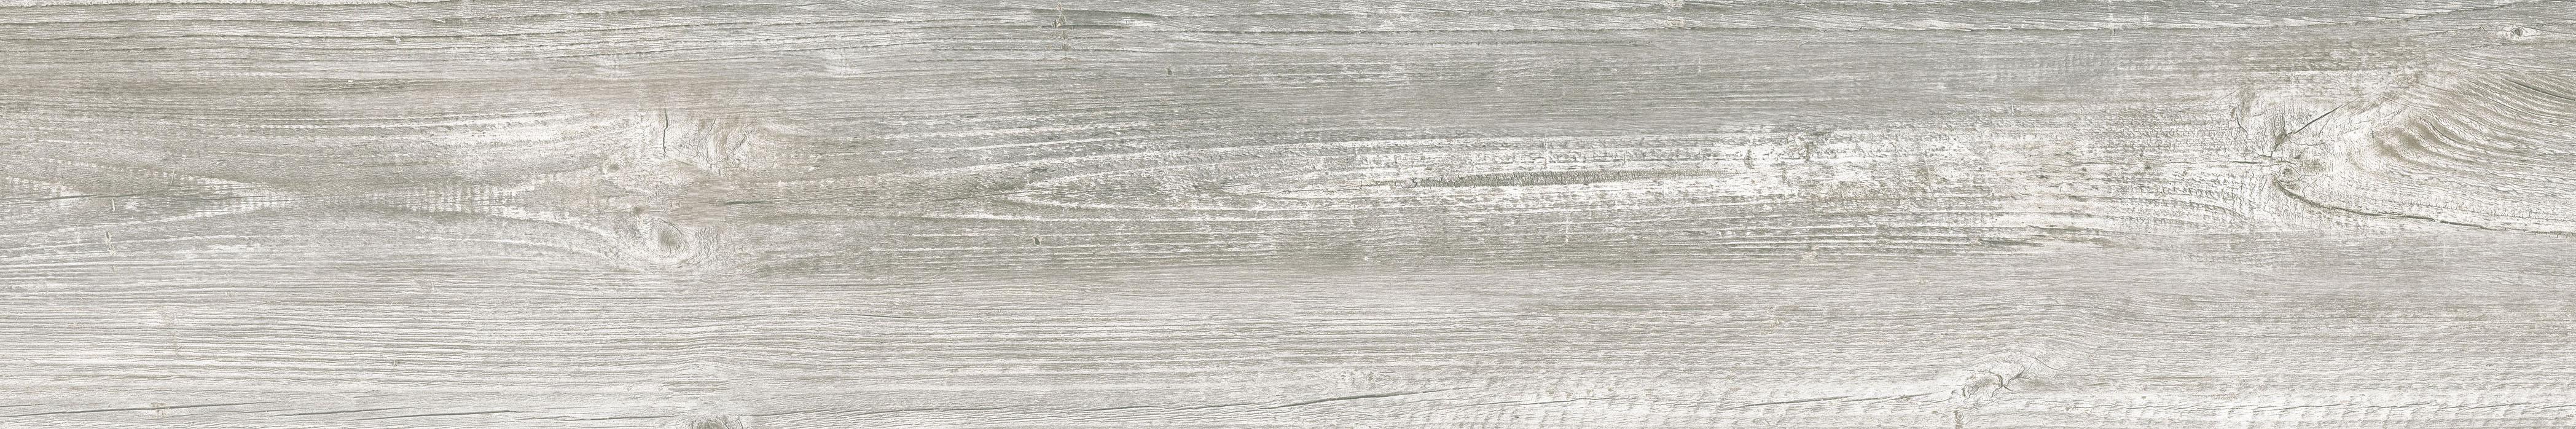 0591246, Artwood, Vaaleanharmaa, lattia,pakkasenkesto,liukastumisenesto